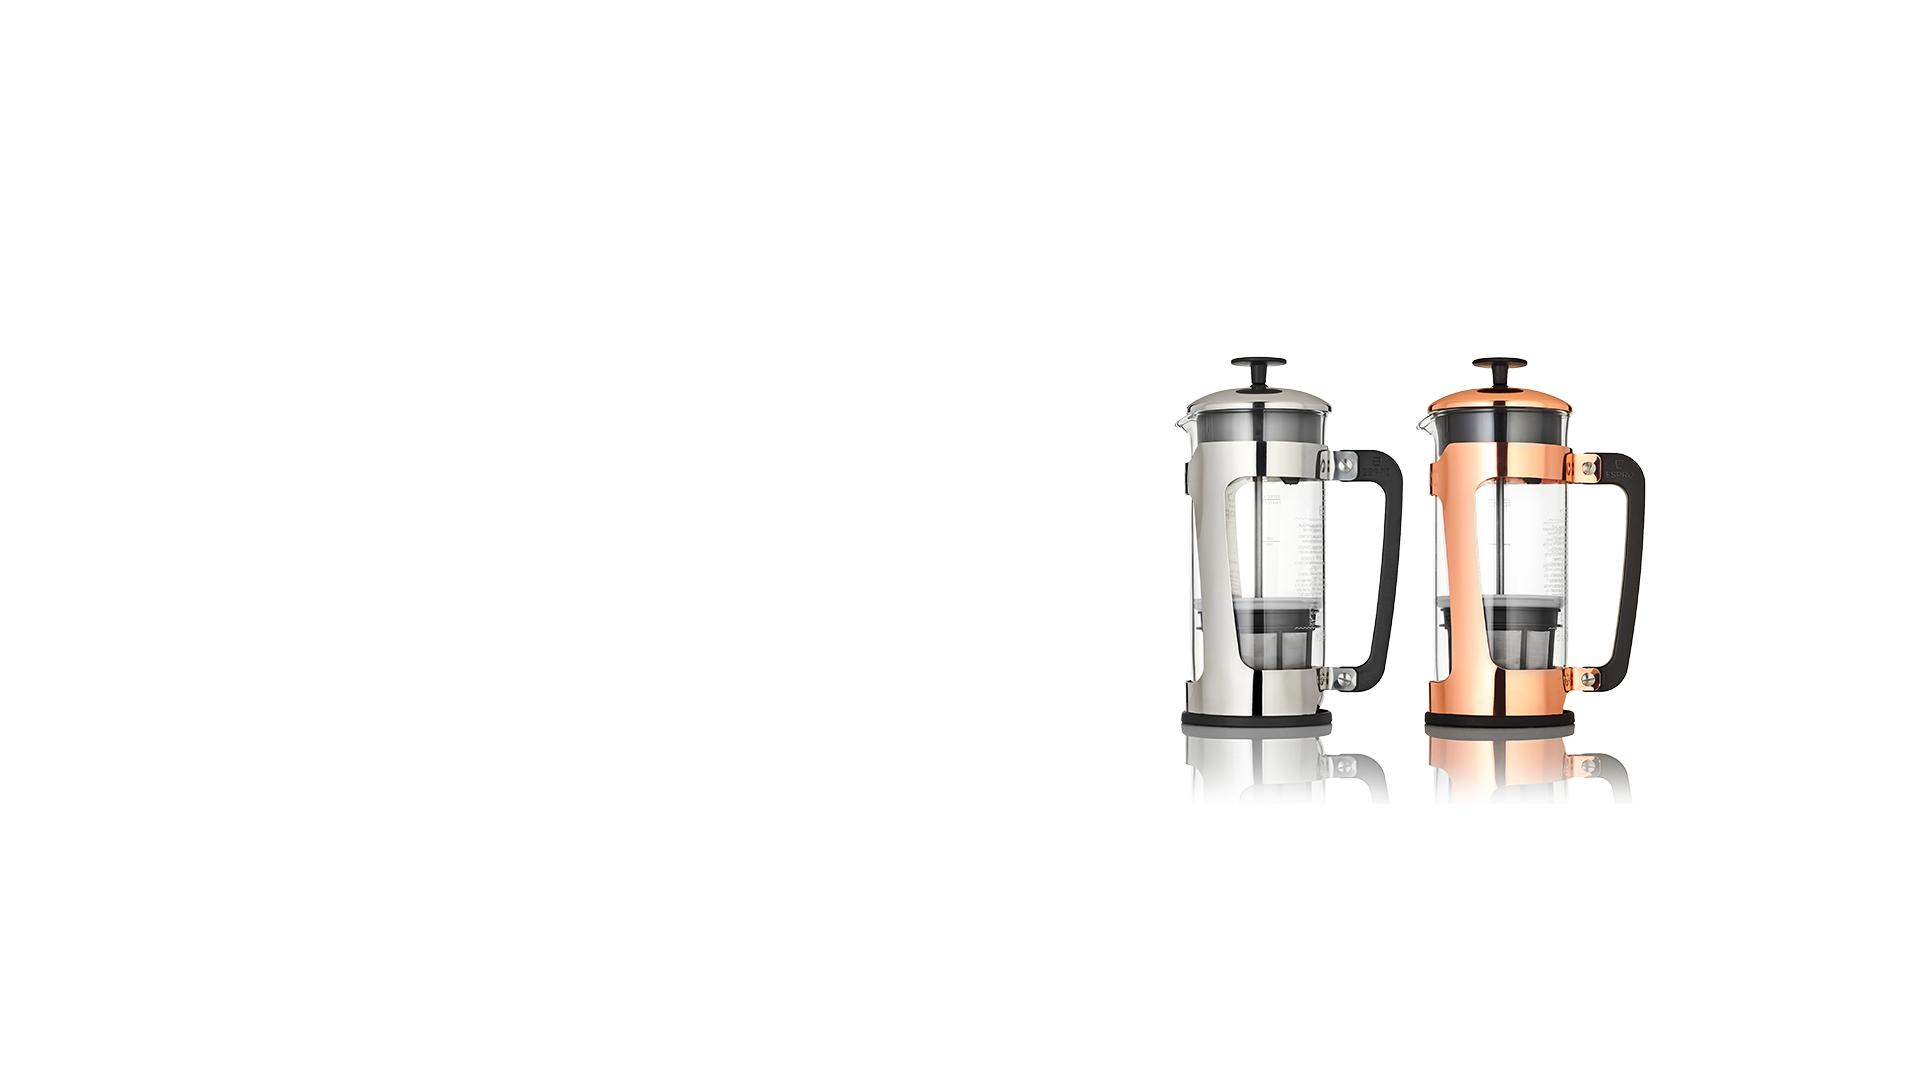 espro press p5 espro make it better coffee and tea gear